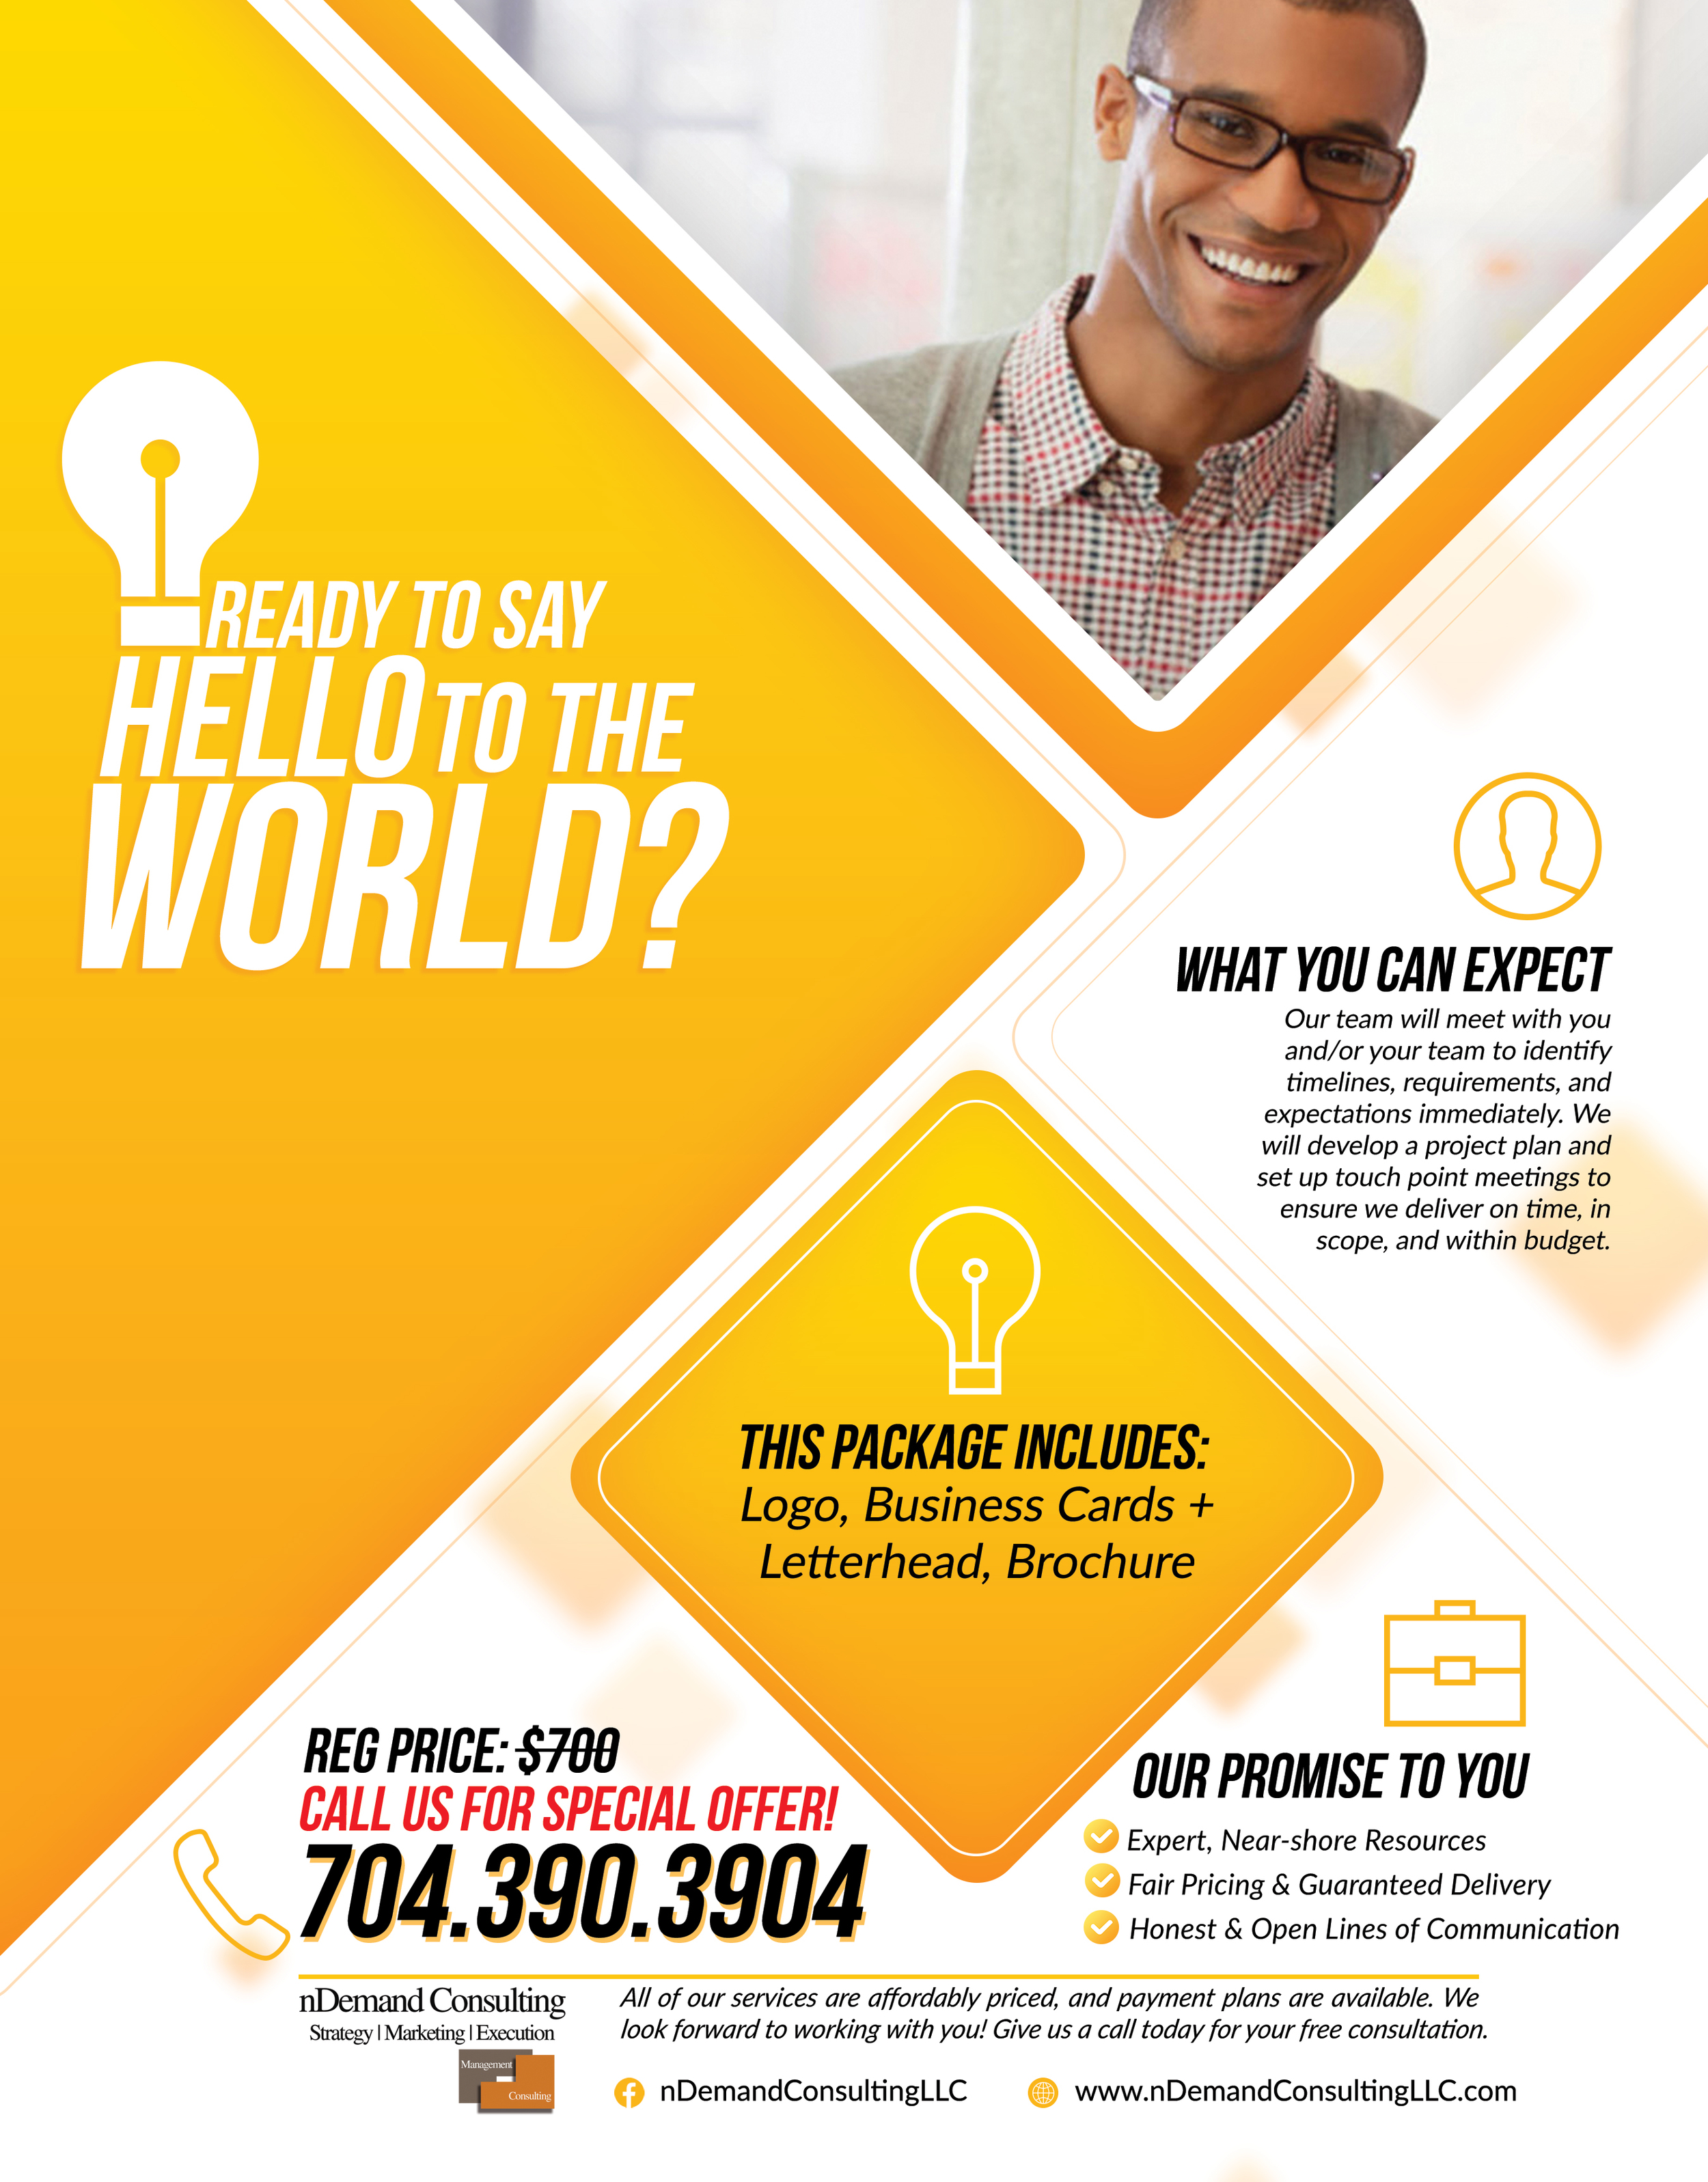 Marketing_Hello-World-Package.jpg